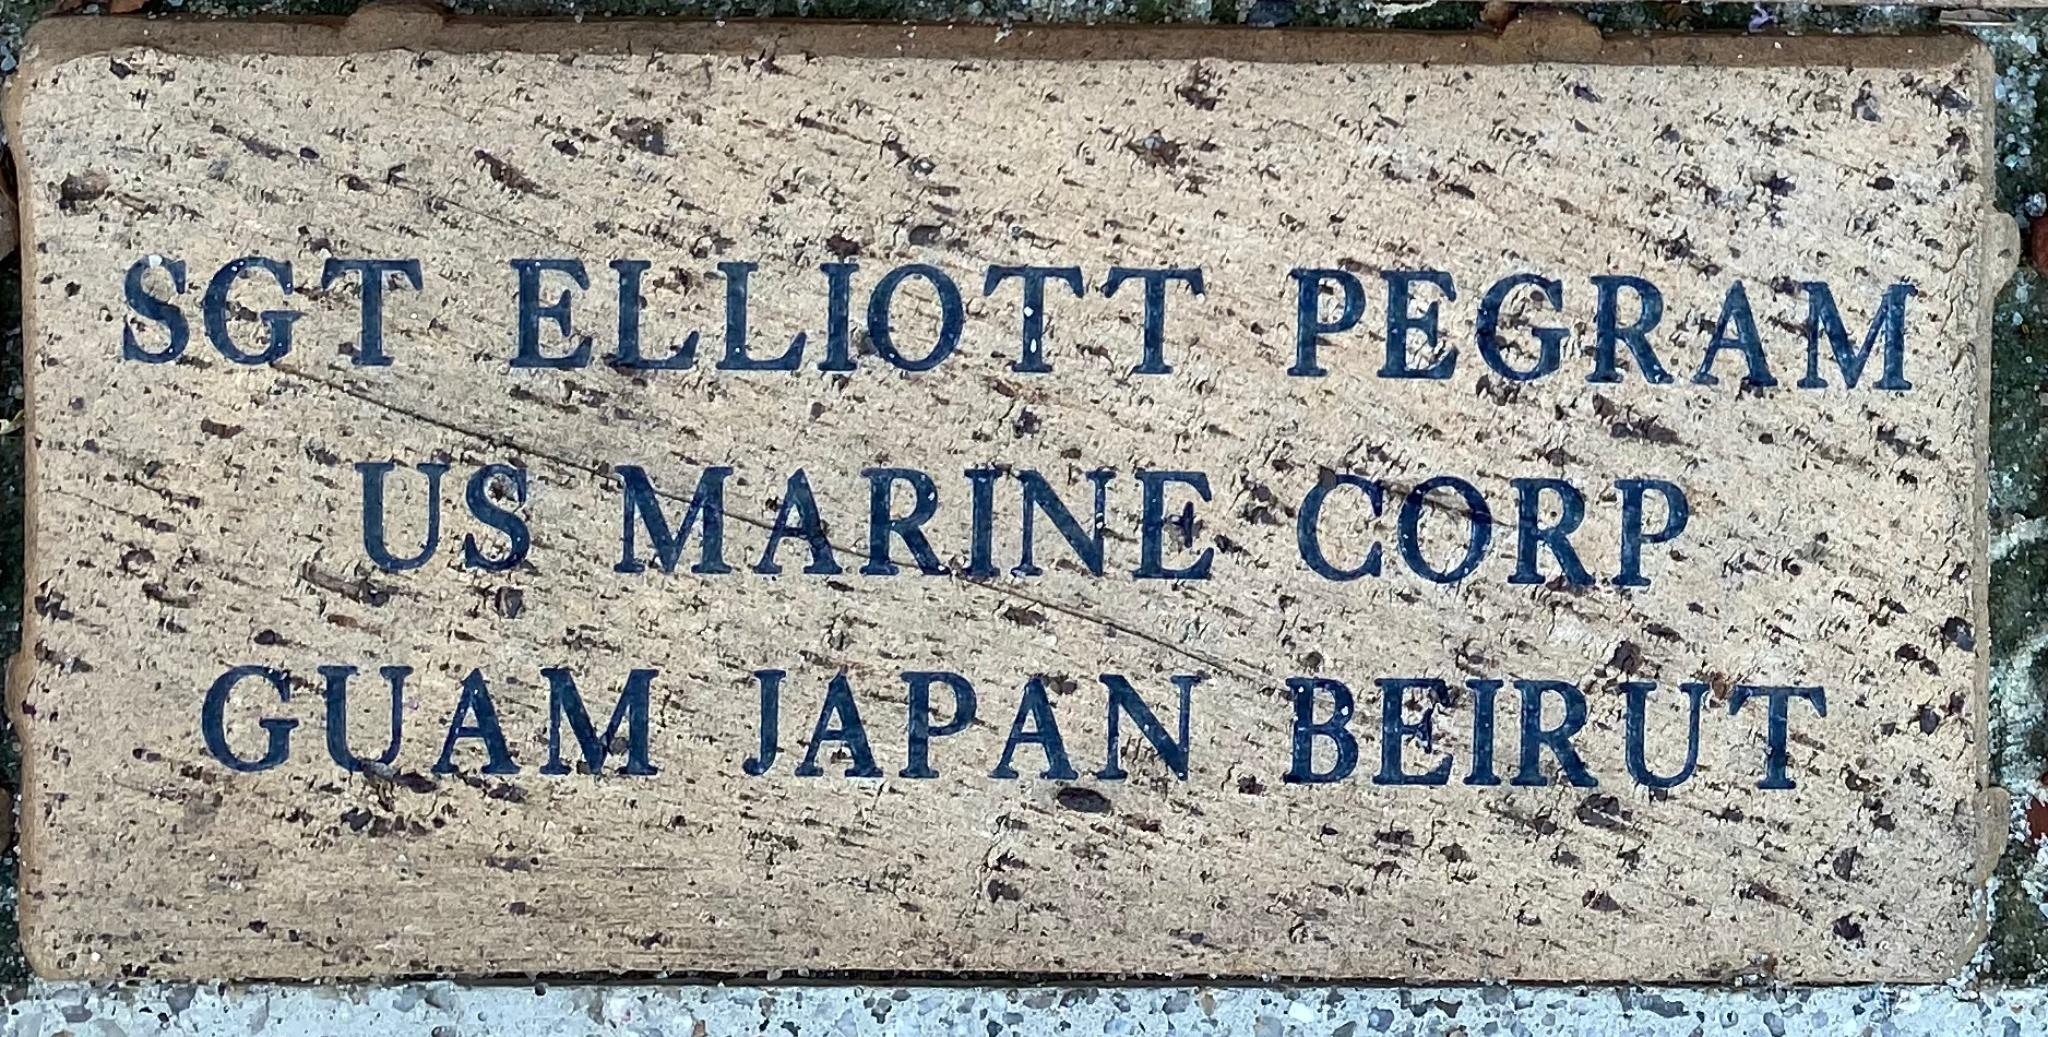 SGT ELLIOTT PEGRAM US MARINE CORP GUAM JAPAN BEIRUT